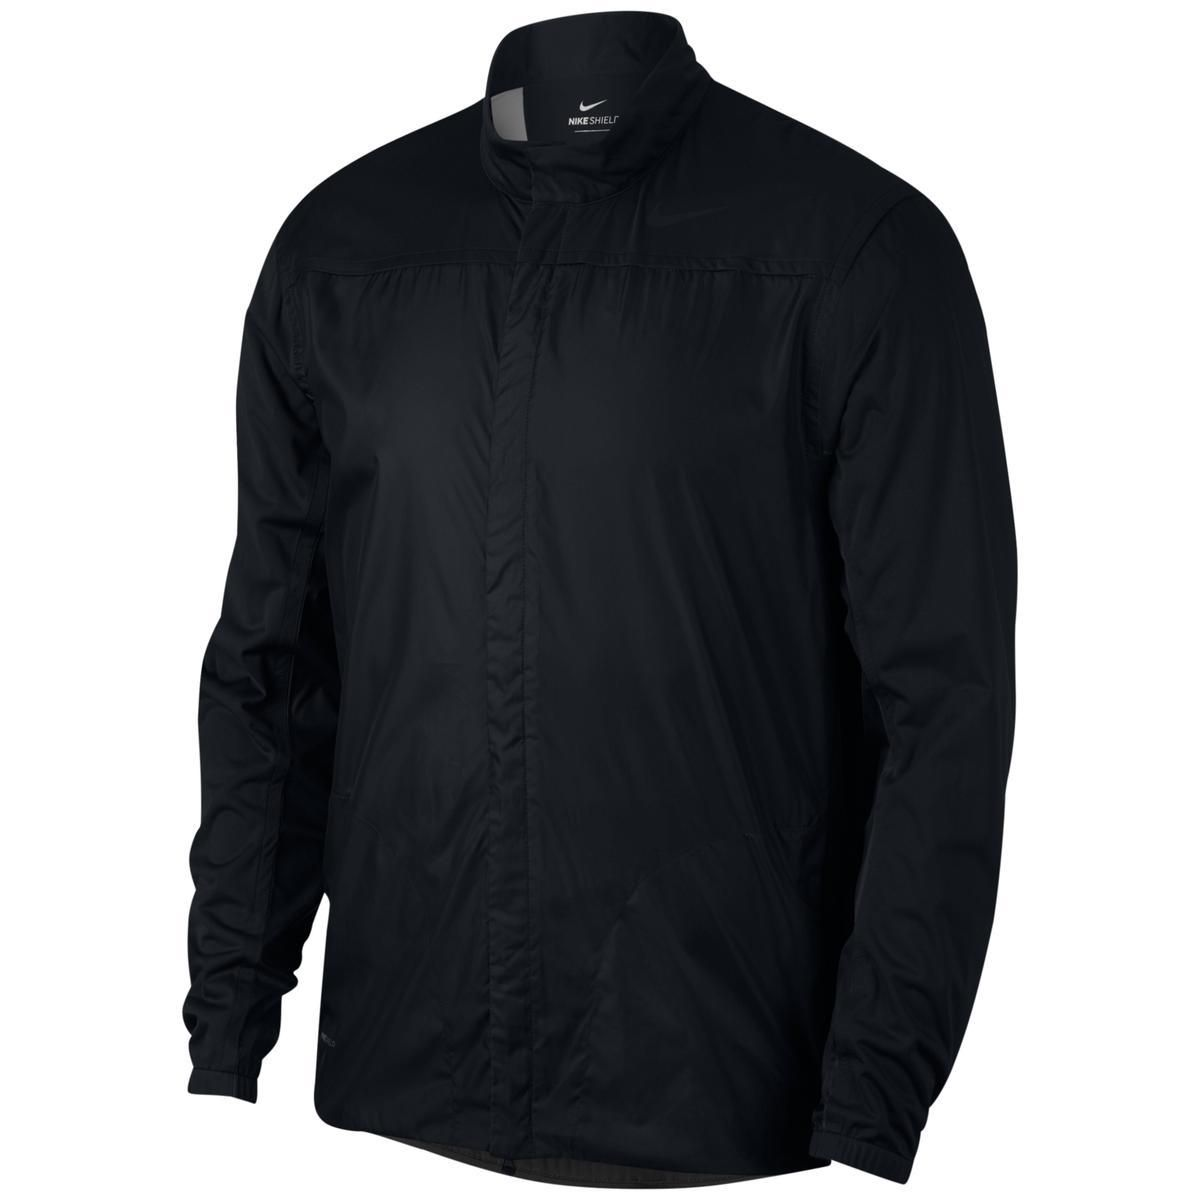 Nike Mens Windbreaker Black Size Large